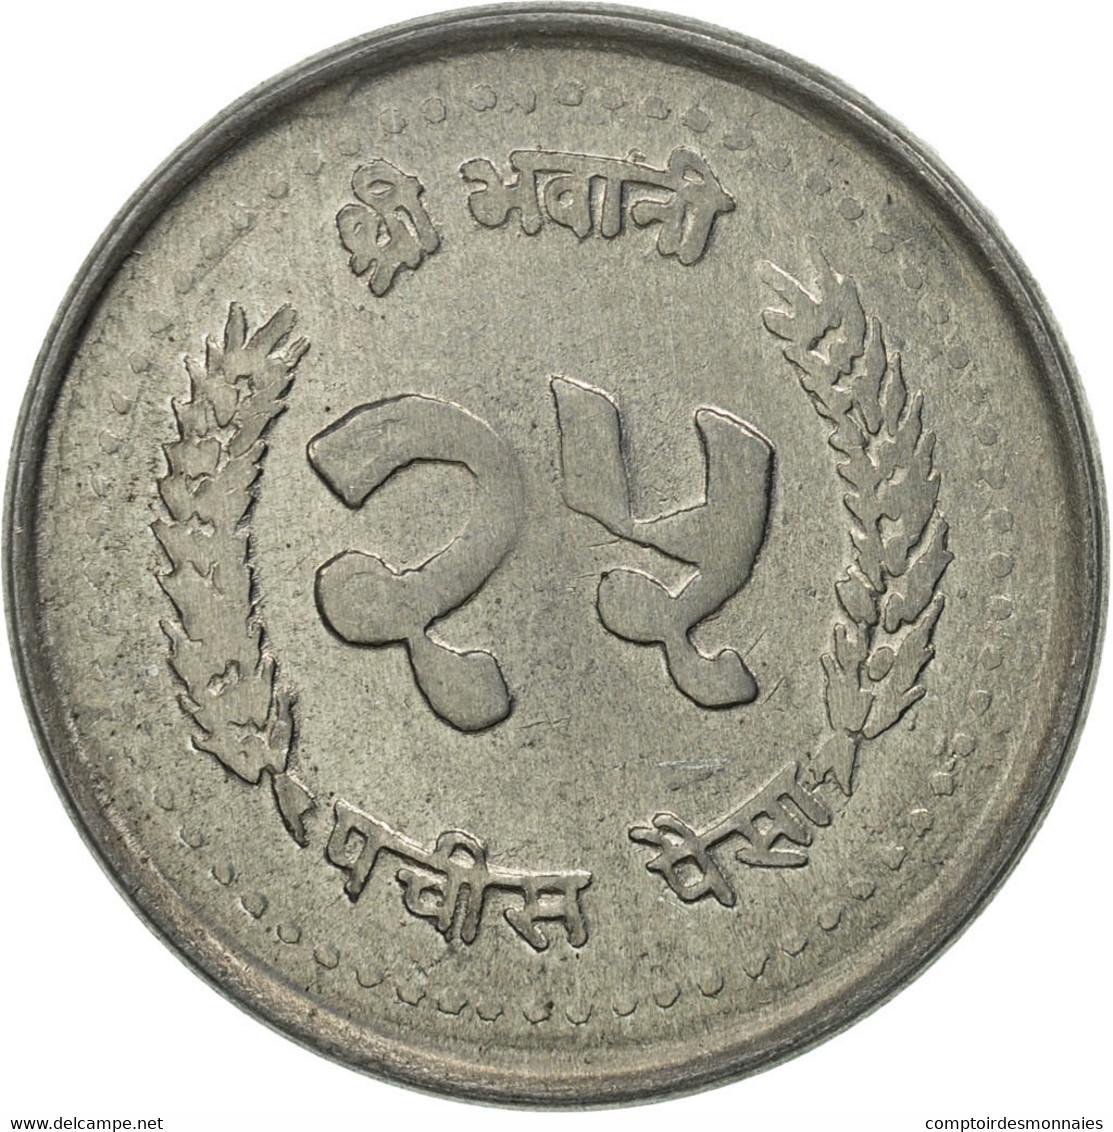 Népal, SHAH DYNASTY, Birendra Bir Bikram, 25 Paisa, 1986, FDC, Aluminium - Népal